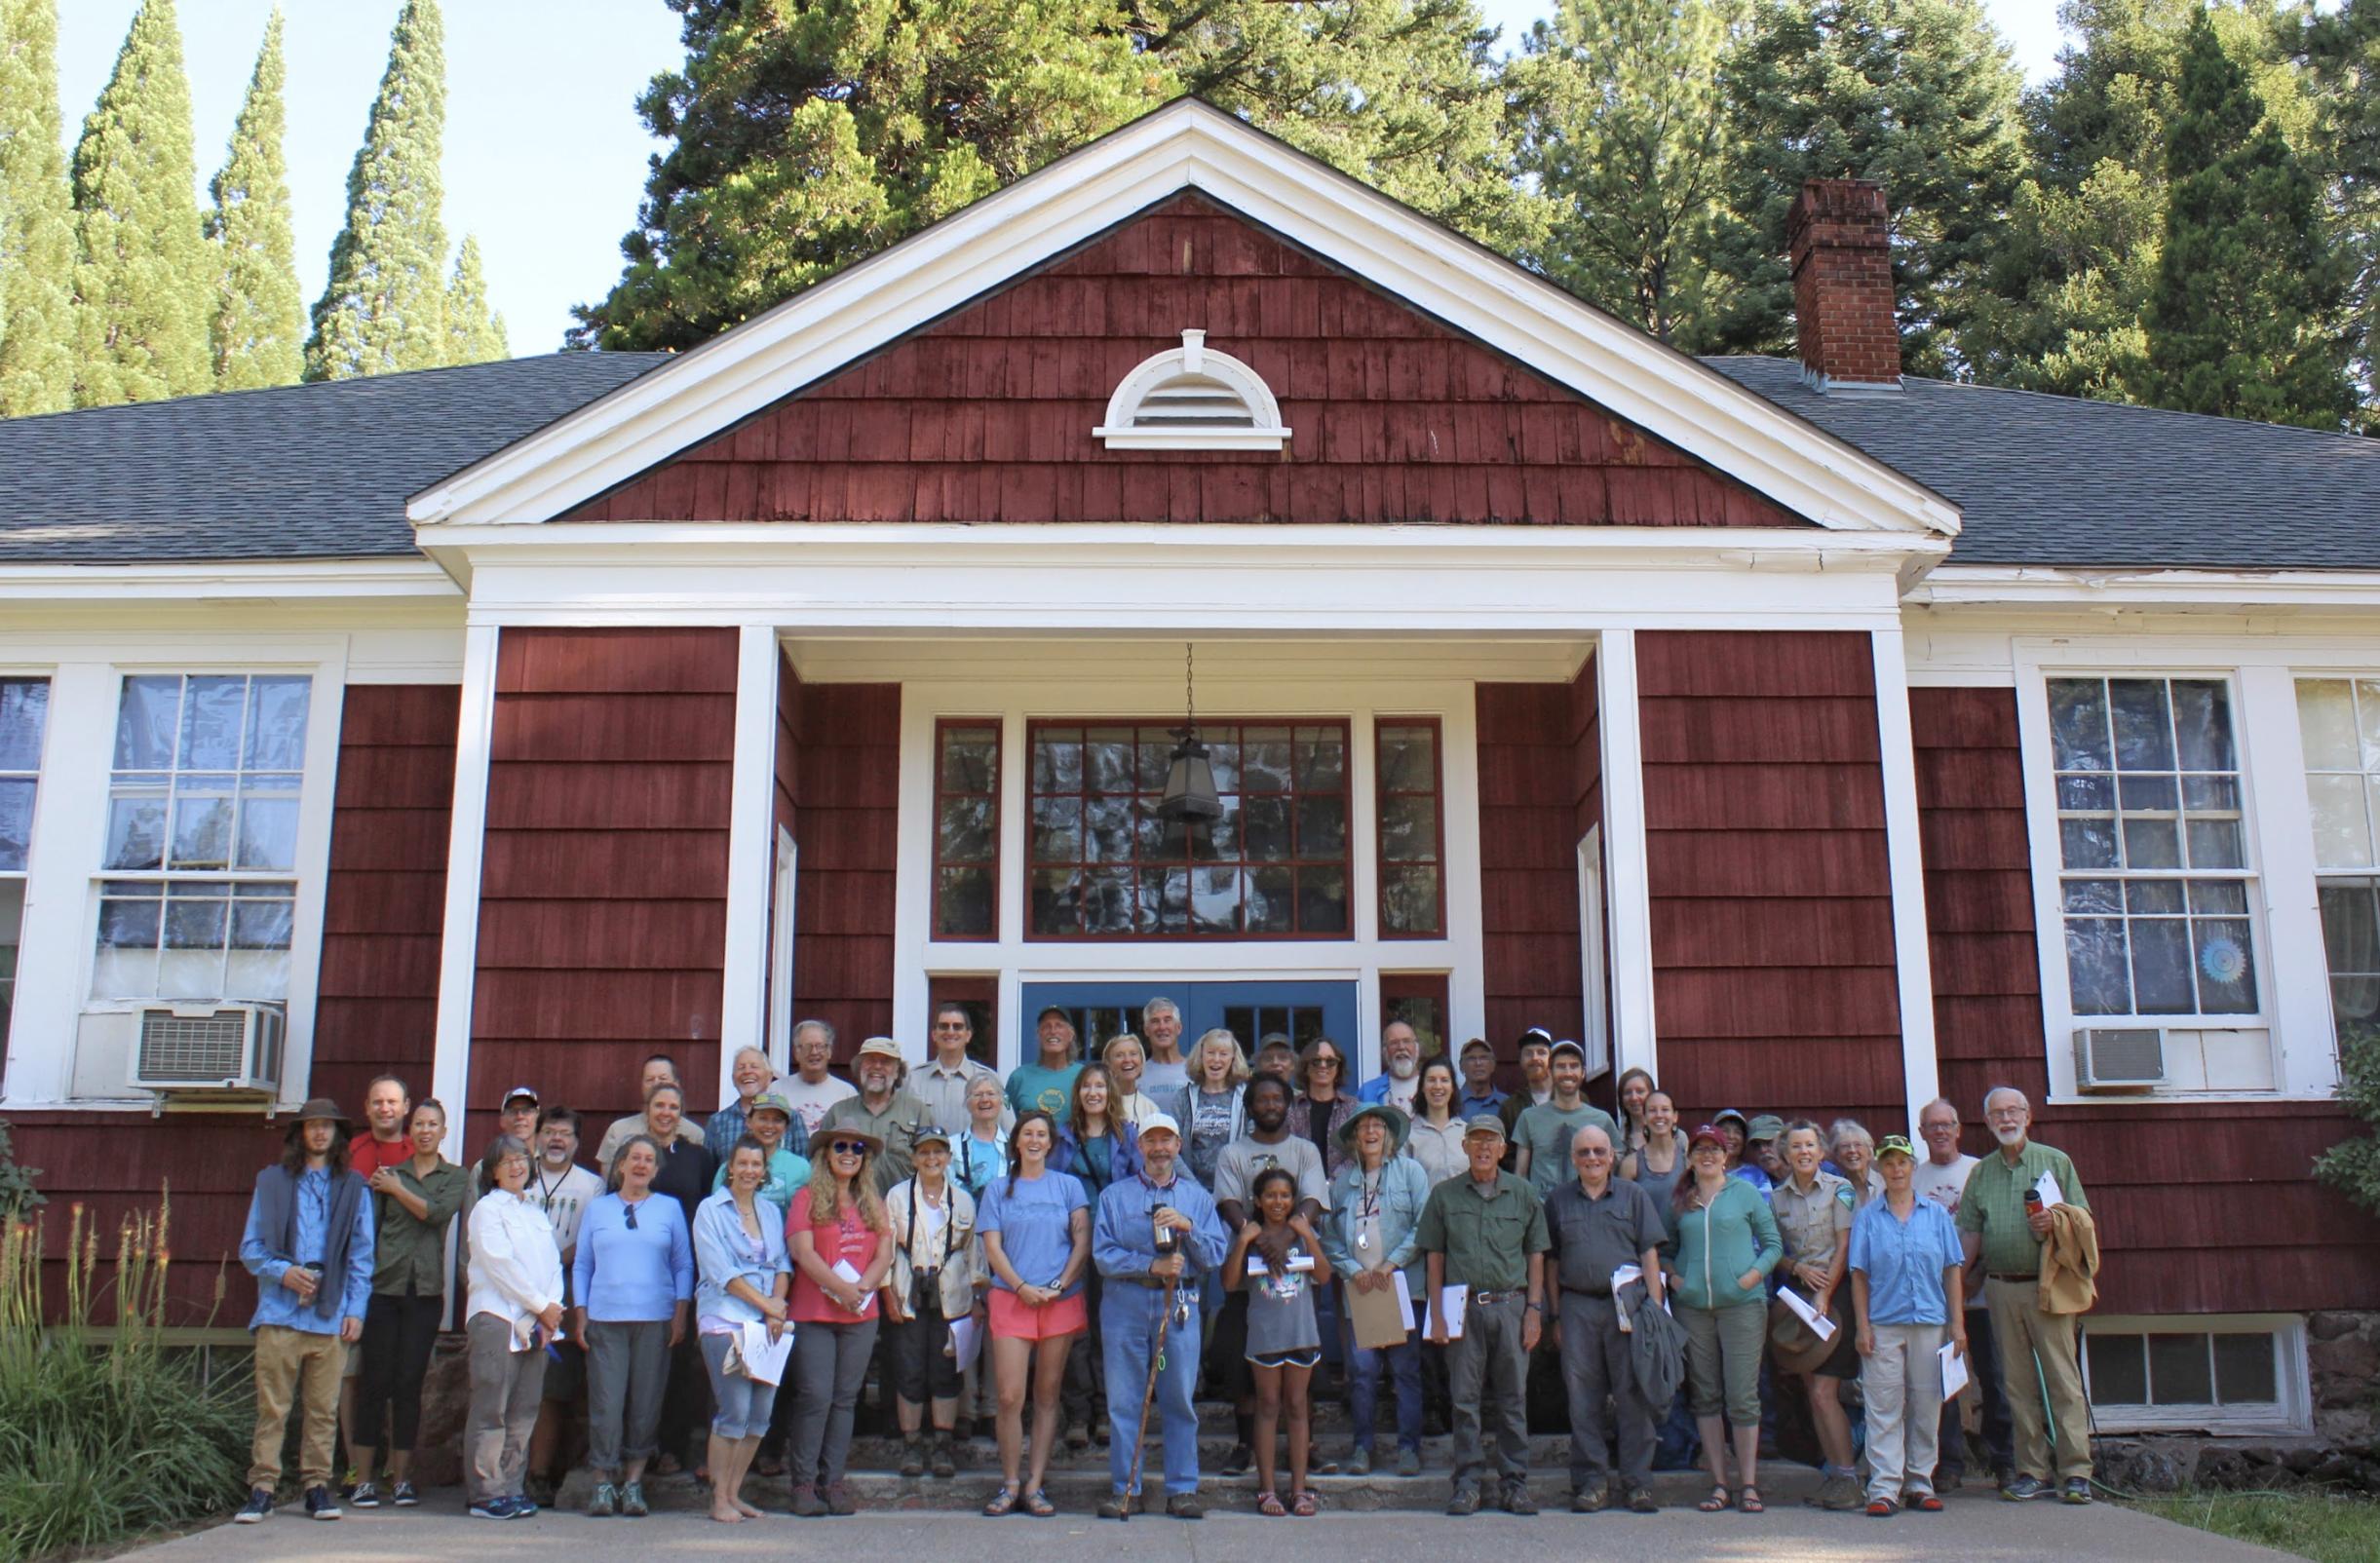 Citizen Scientists pose in front of Pinehurst School.